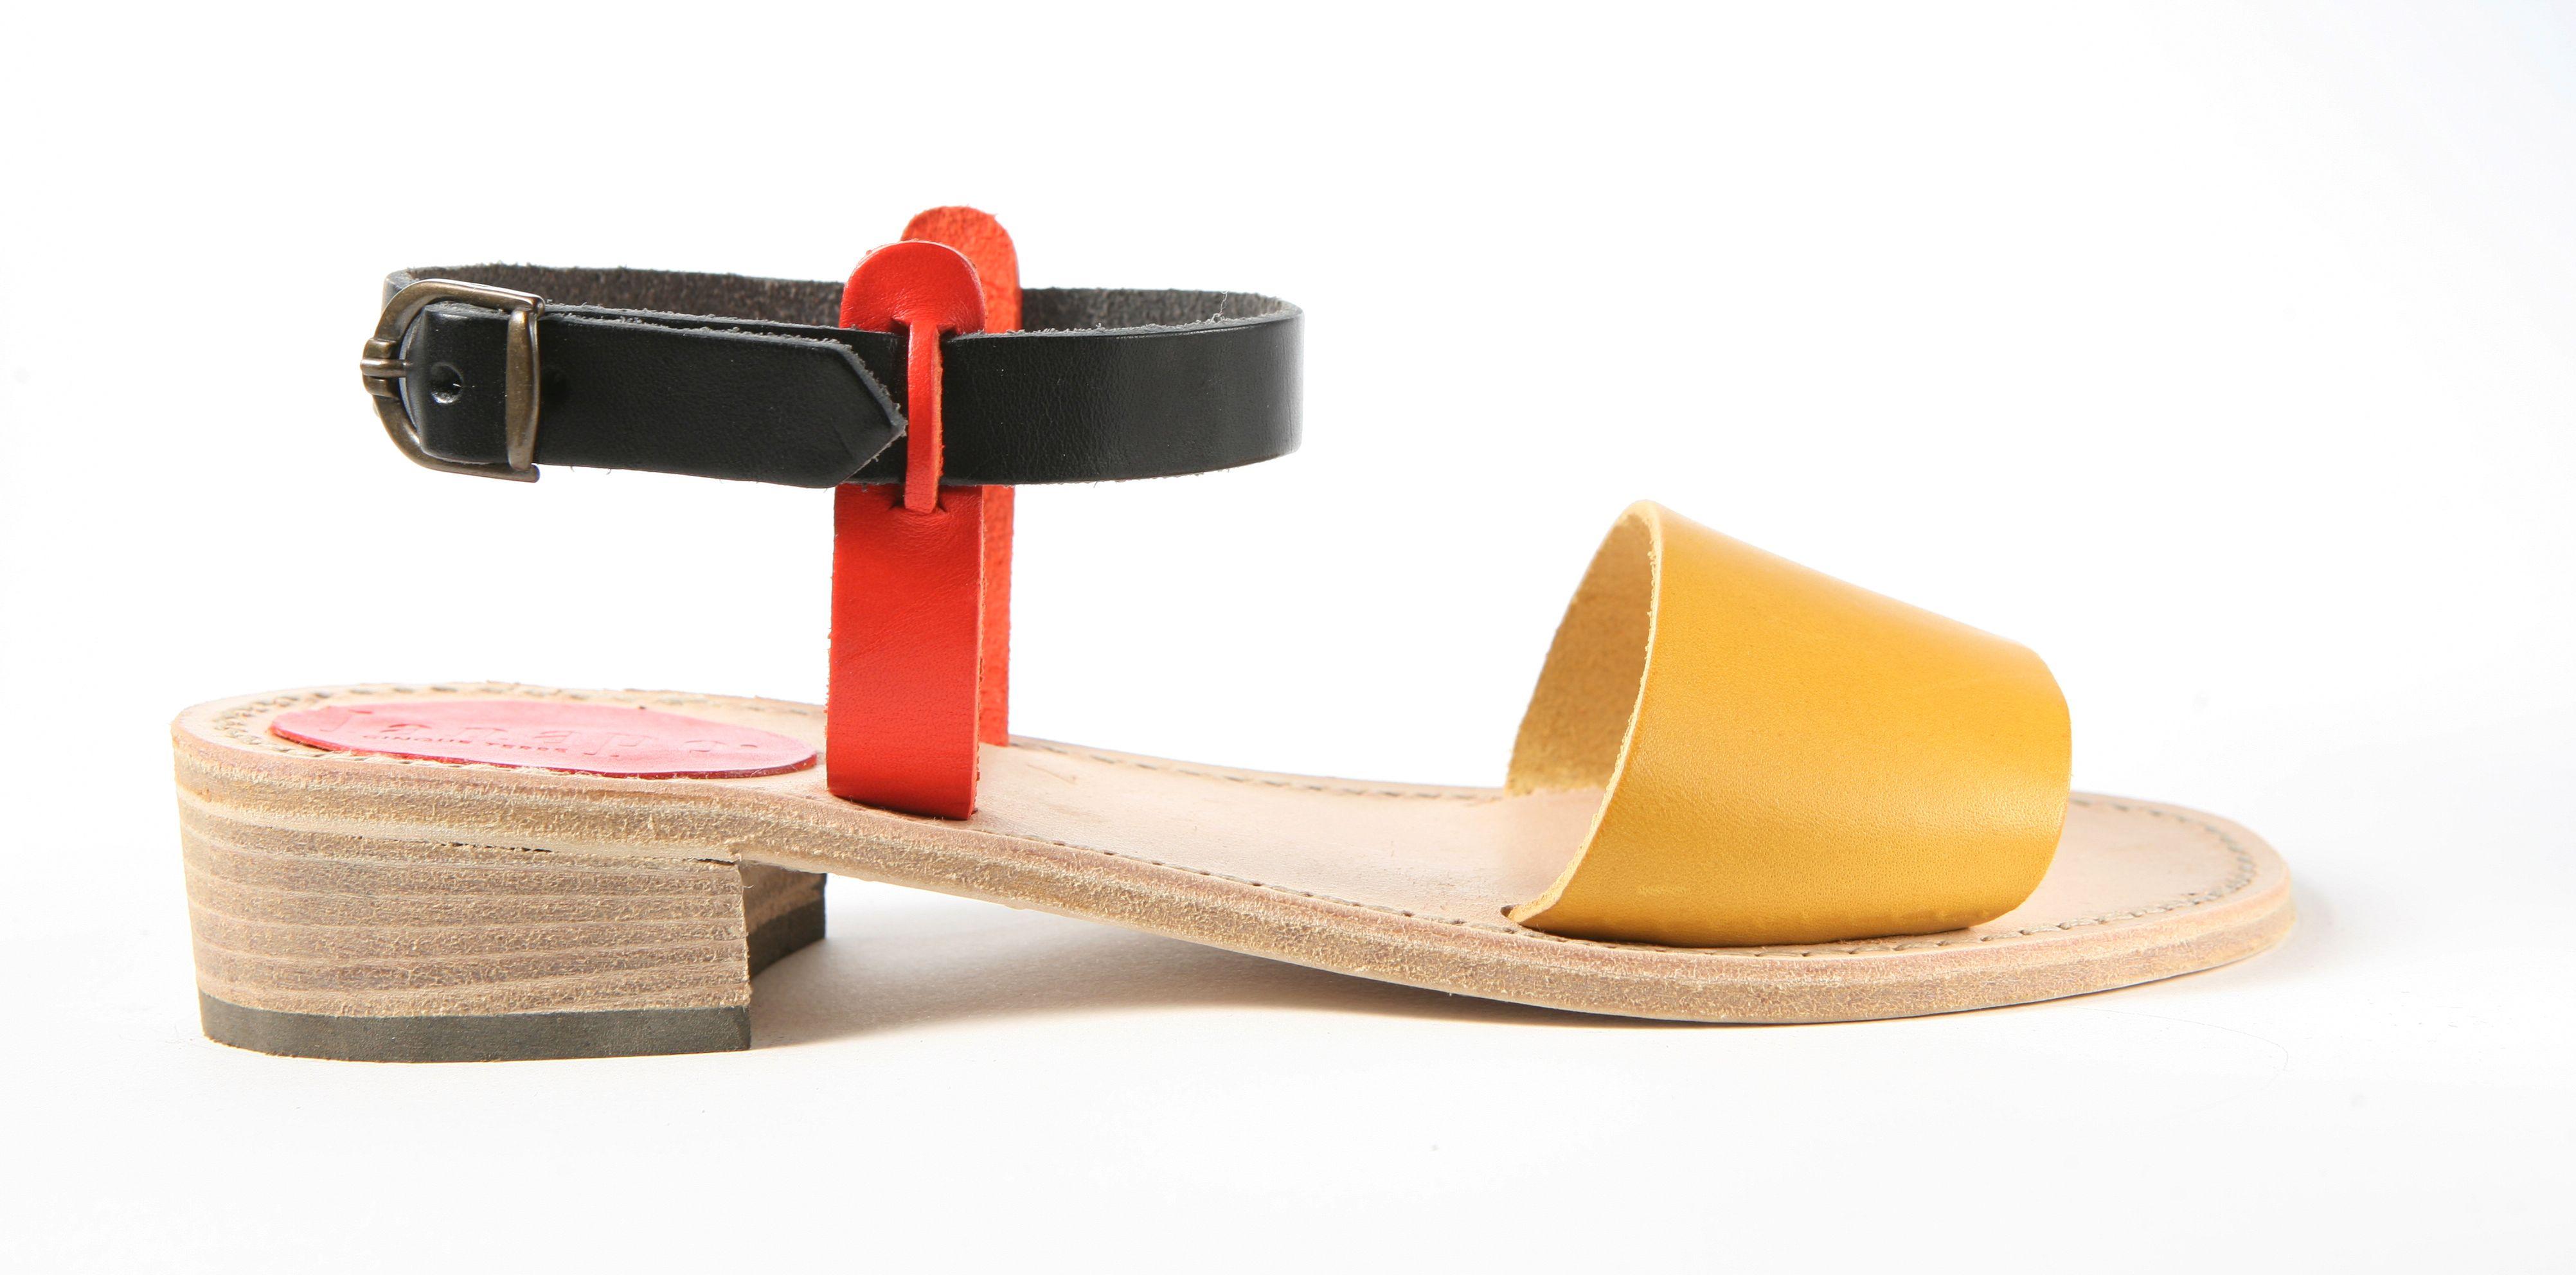 Pin by rachel corry on S A N D A L E E in 2019   Sandals